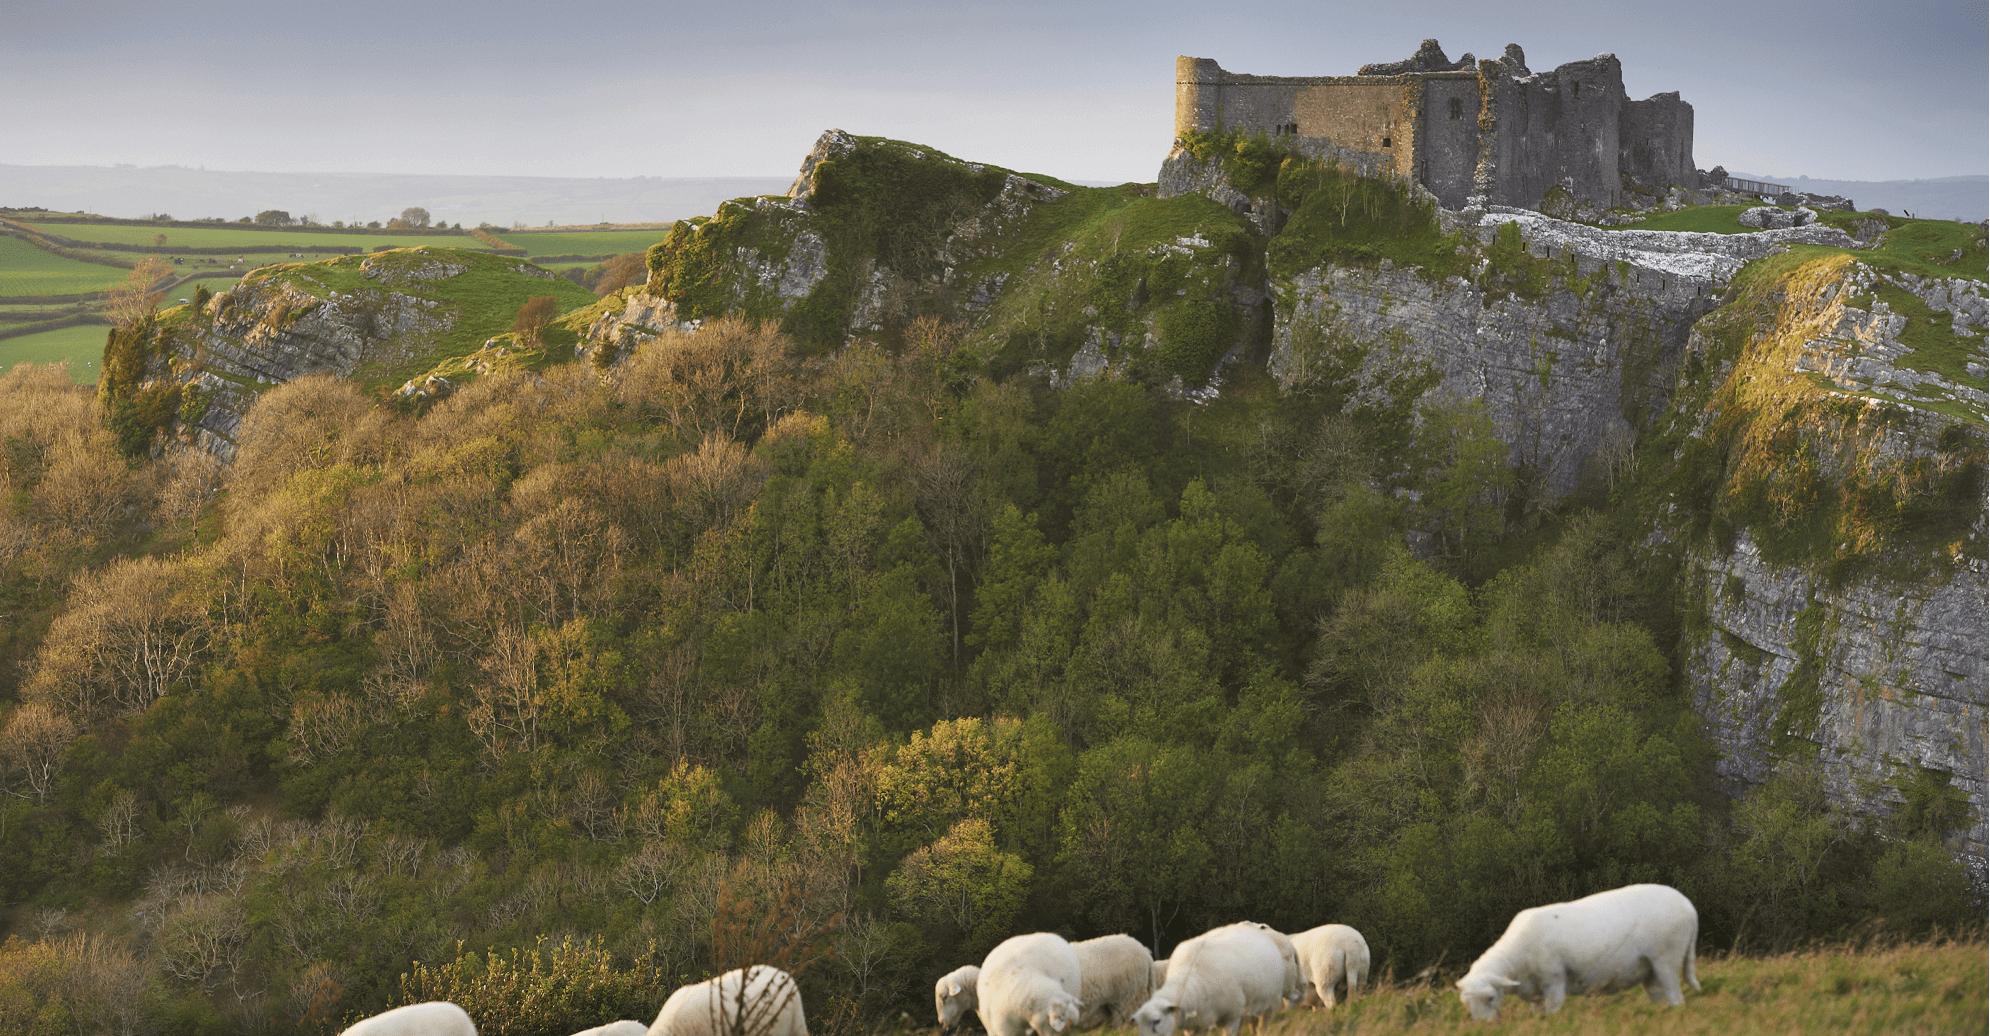 Carreg Cennan Castle